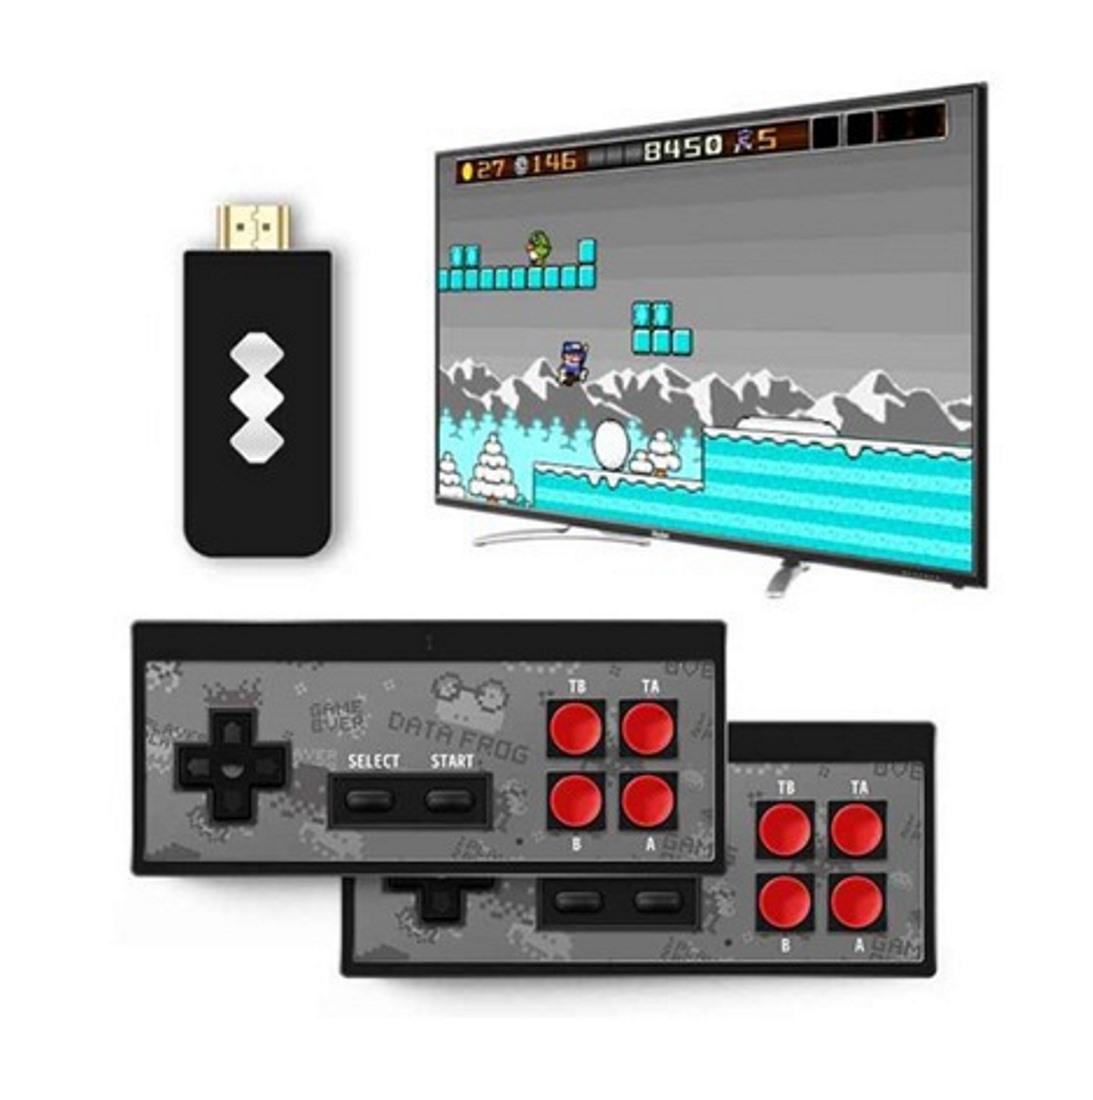 BB EXTREME bluetooth mini game box - AV (620 JÁTÉK) konzol